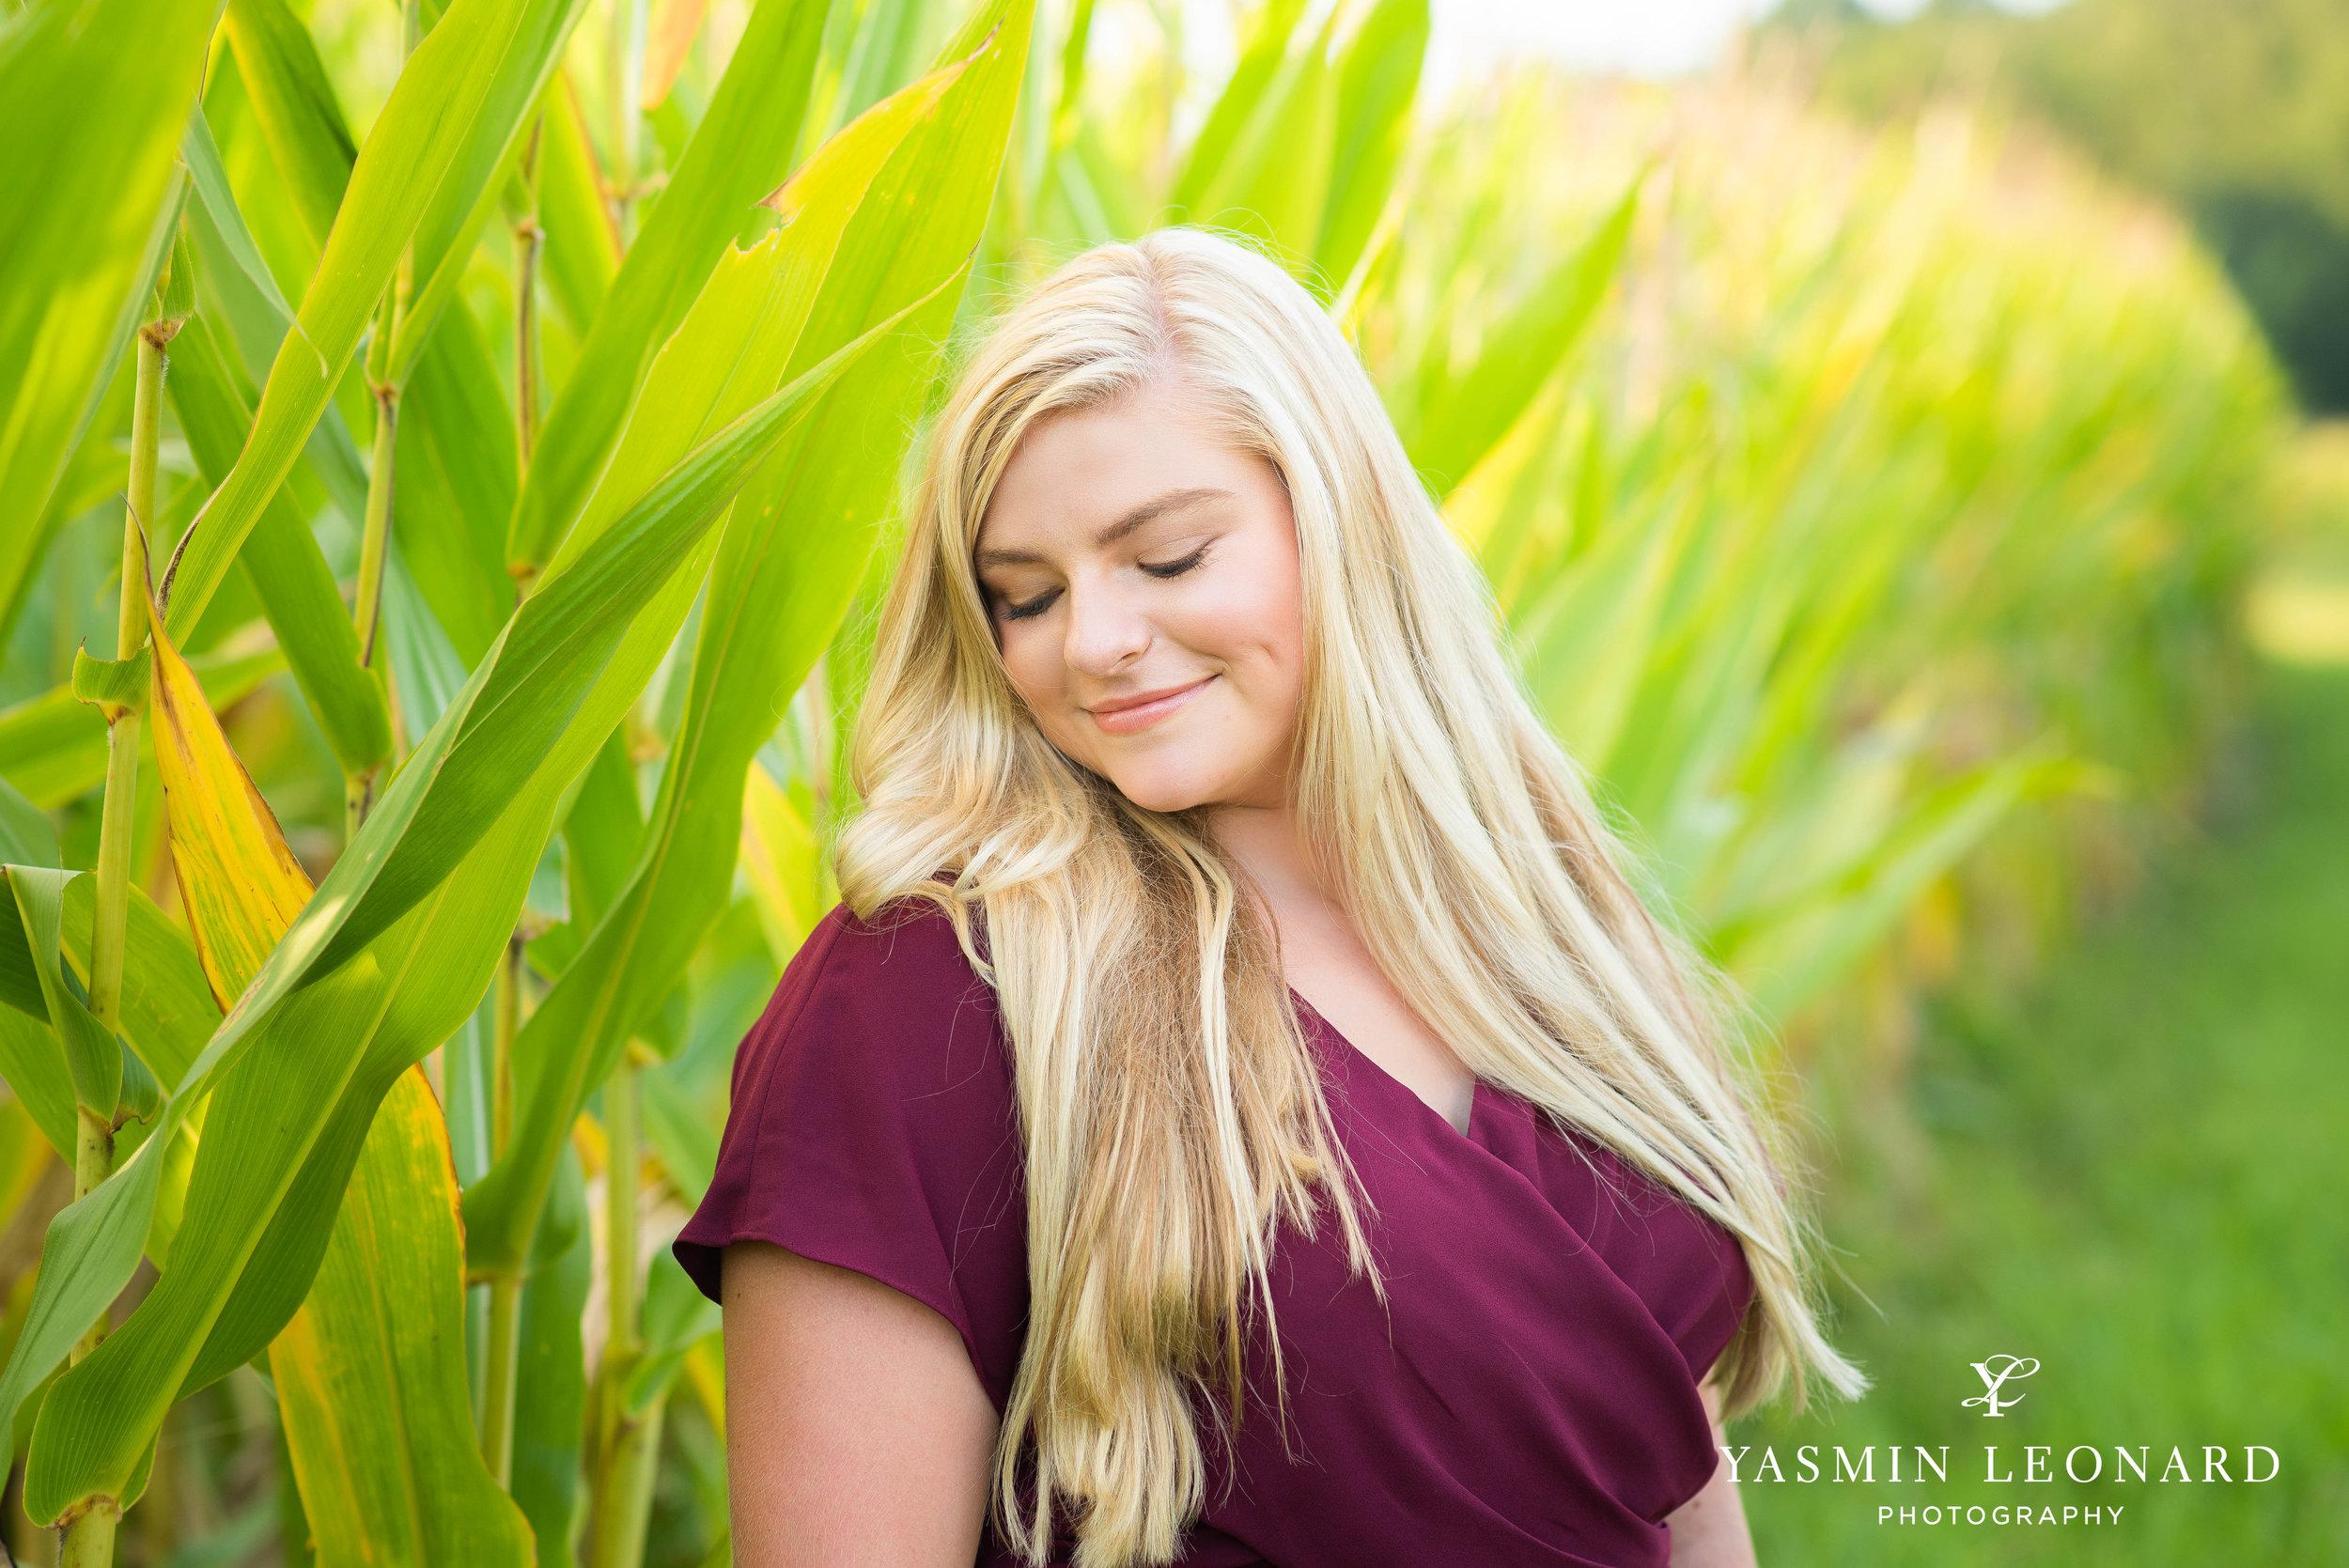 Senior Poses - Girl Senior Poses - Country Senior - Tractor with Senior - Willow Creek Senoir Portratis - Summer Senior Portrait Outfits - Yasmin Leonard PHotography - Mackenzie-4.jpg